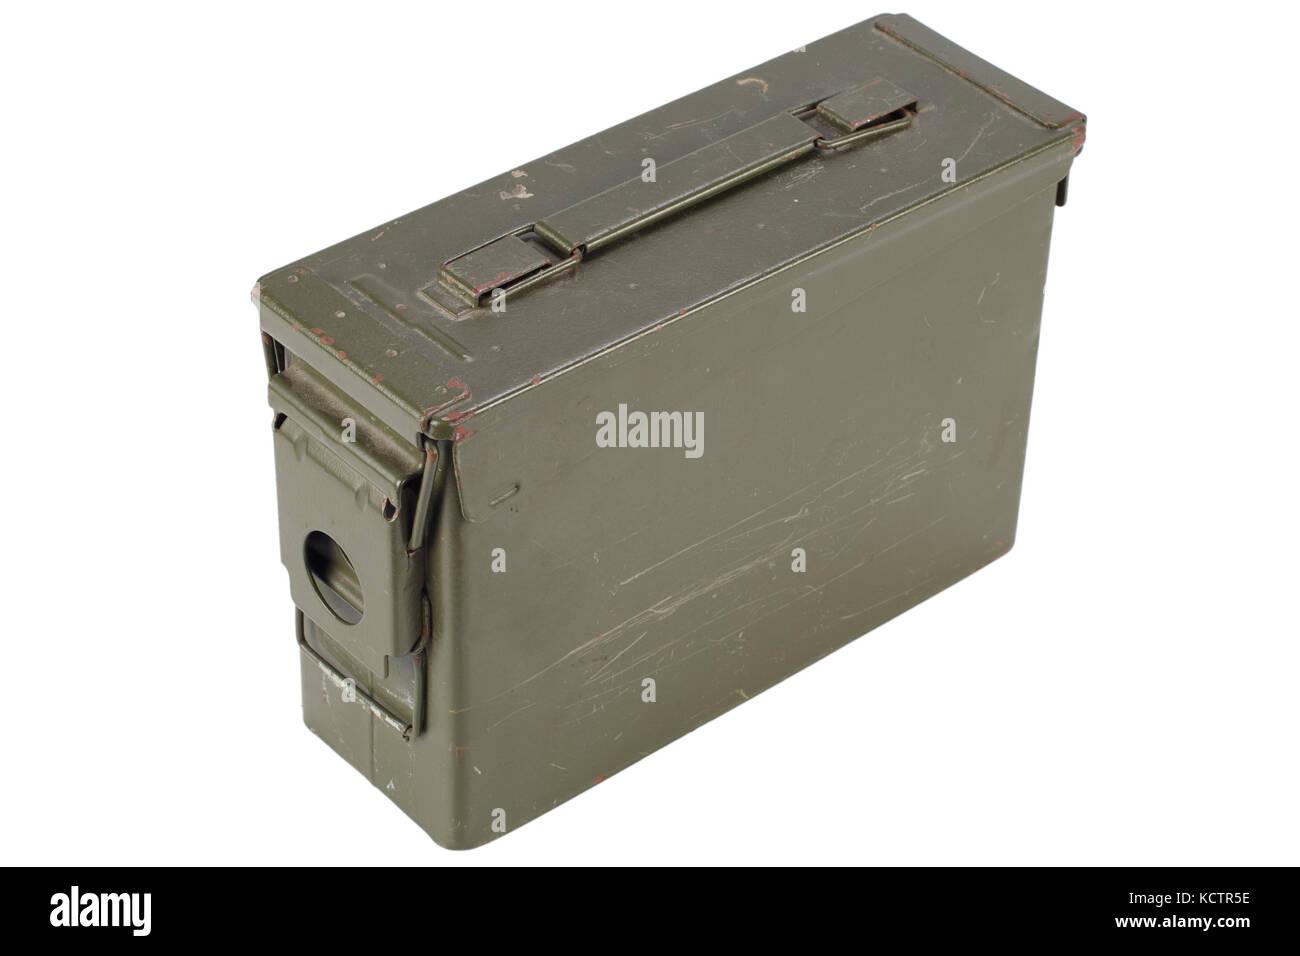 .30 Cal Metal Ammo Can - Stock Image